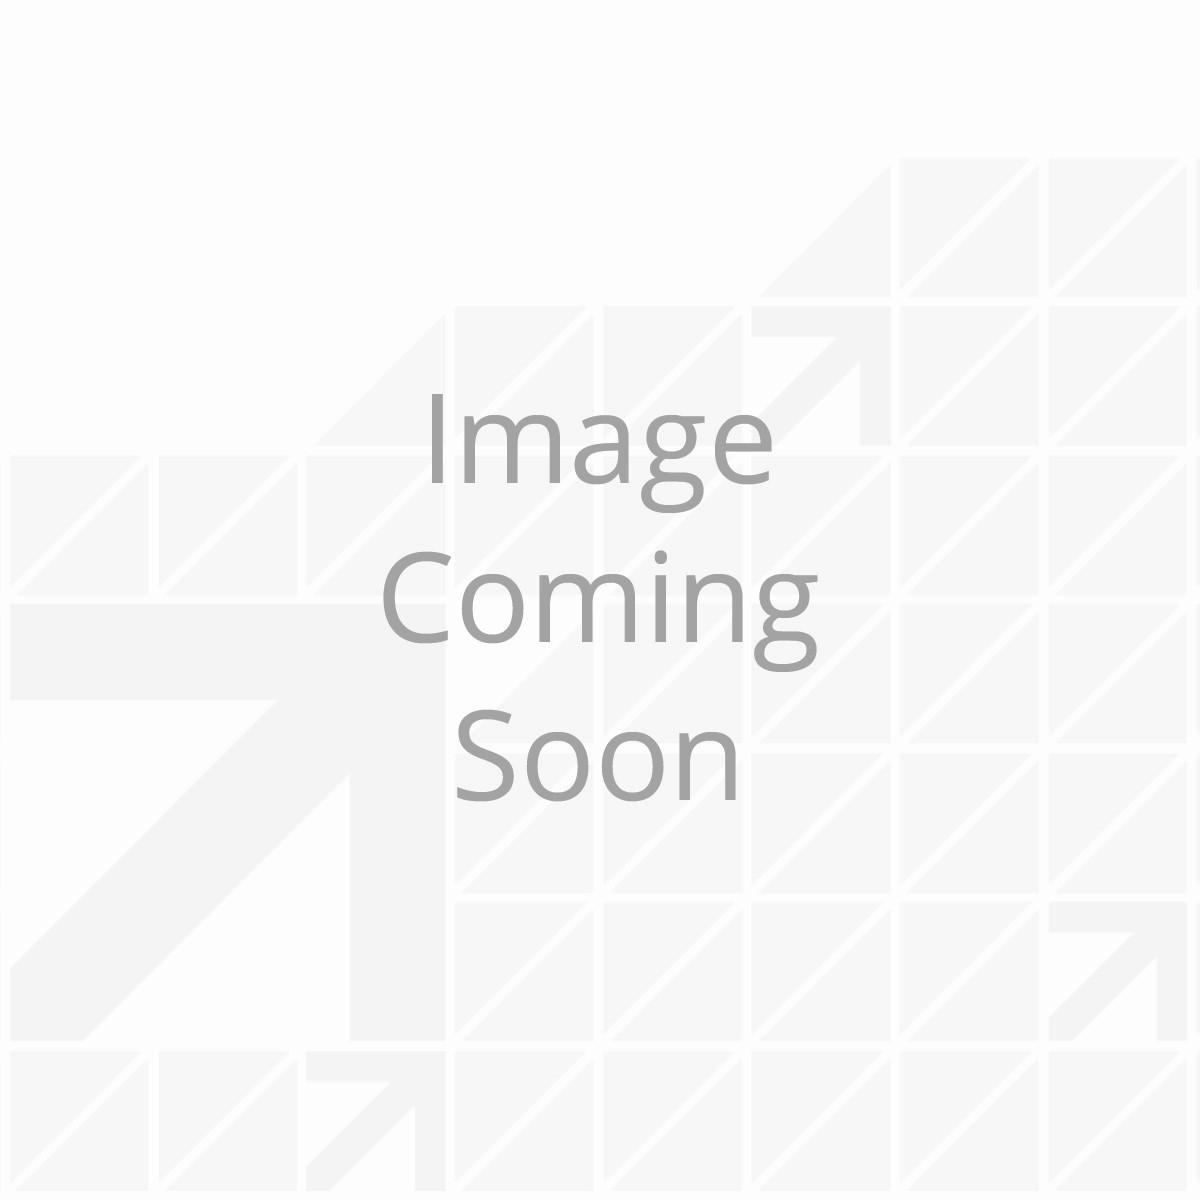 Men's Under Armour 1/4 Zip in White - Various Sizes